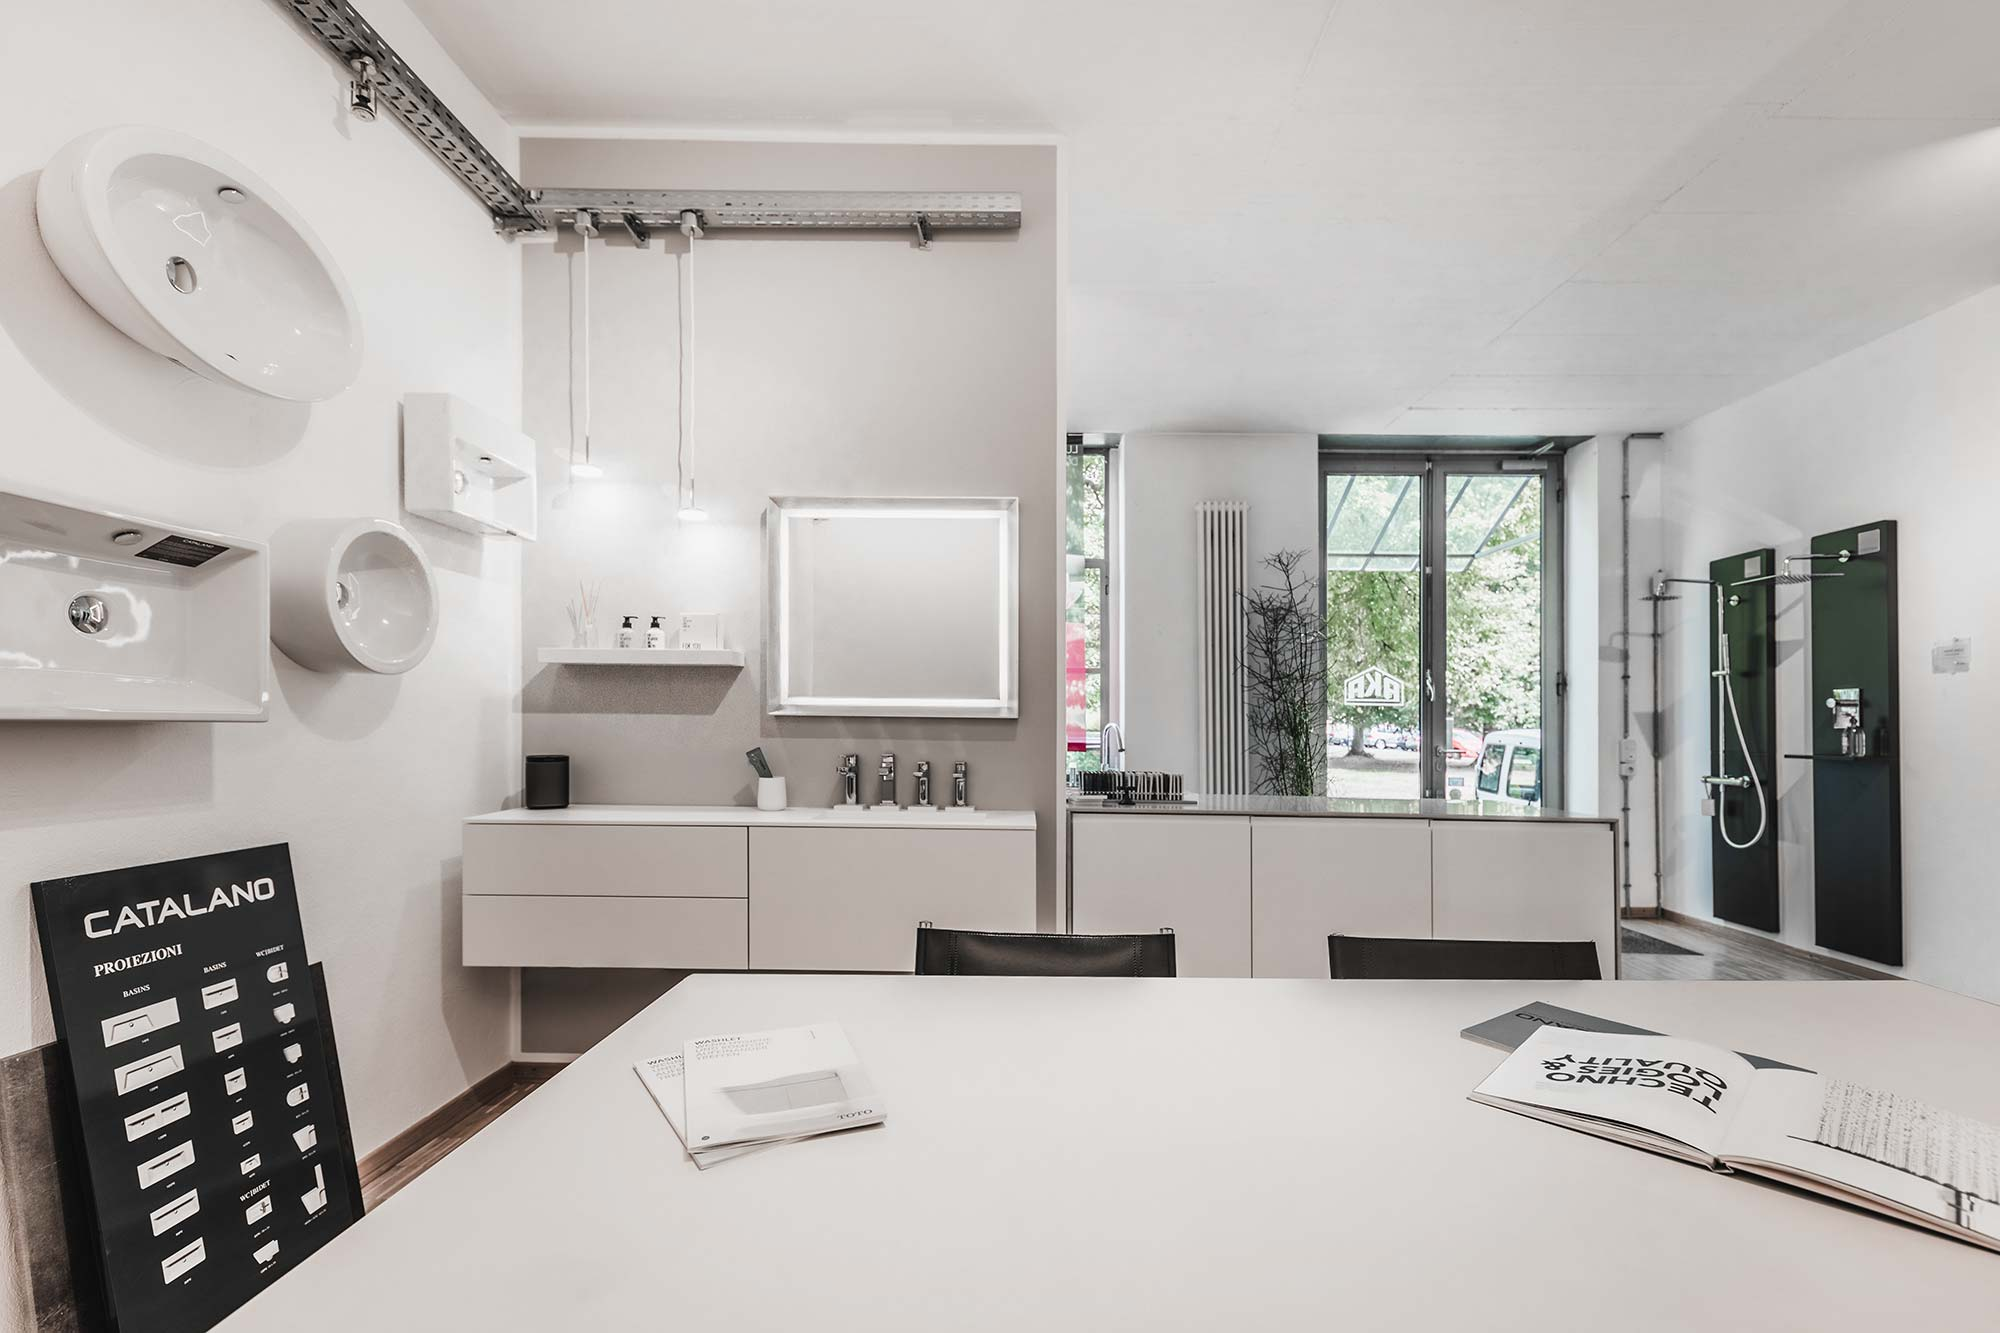 Badezimmer Ausstellung